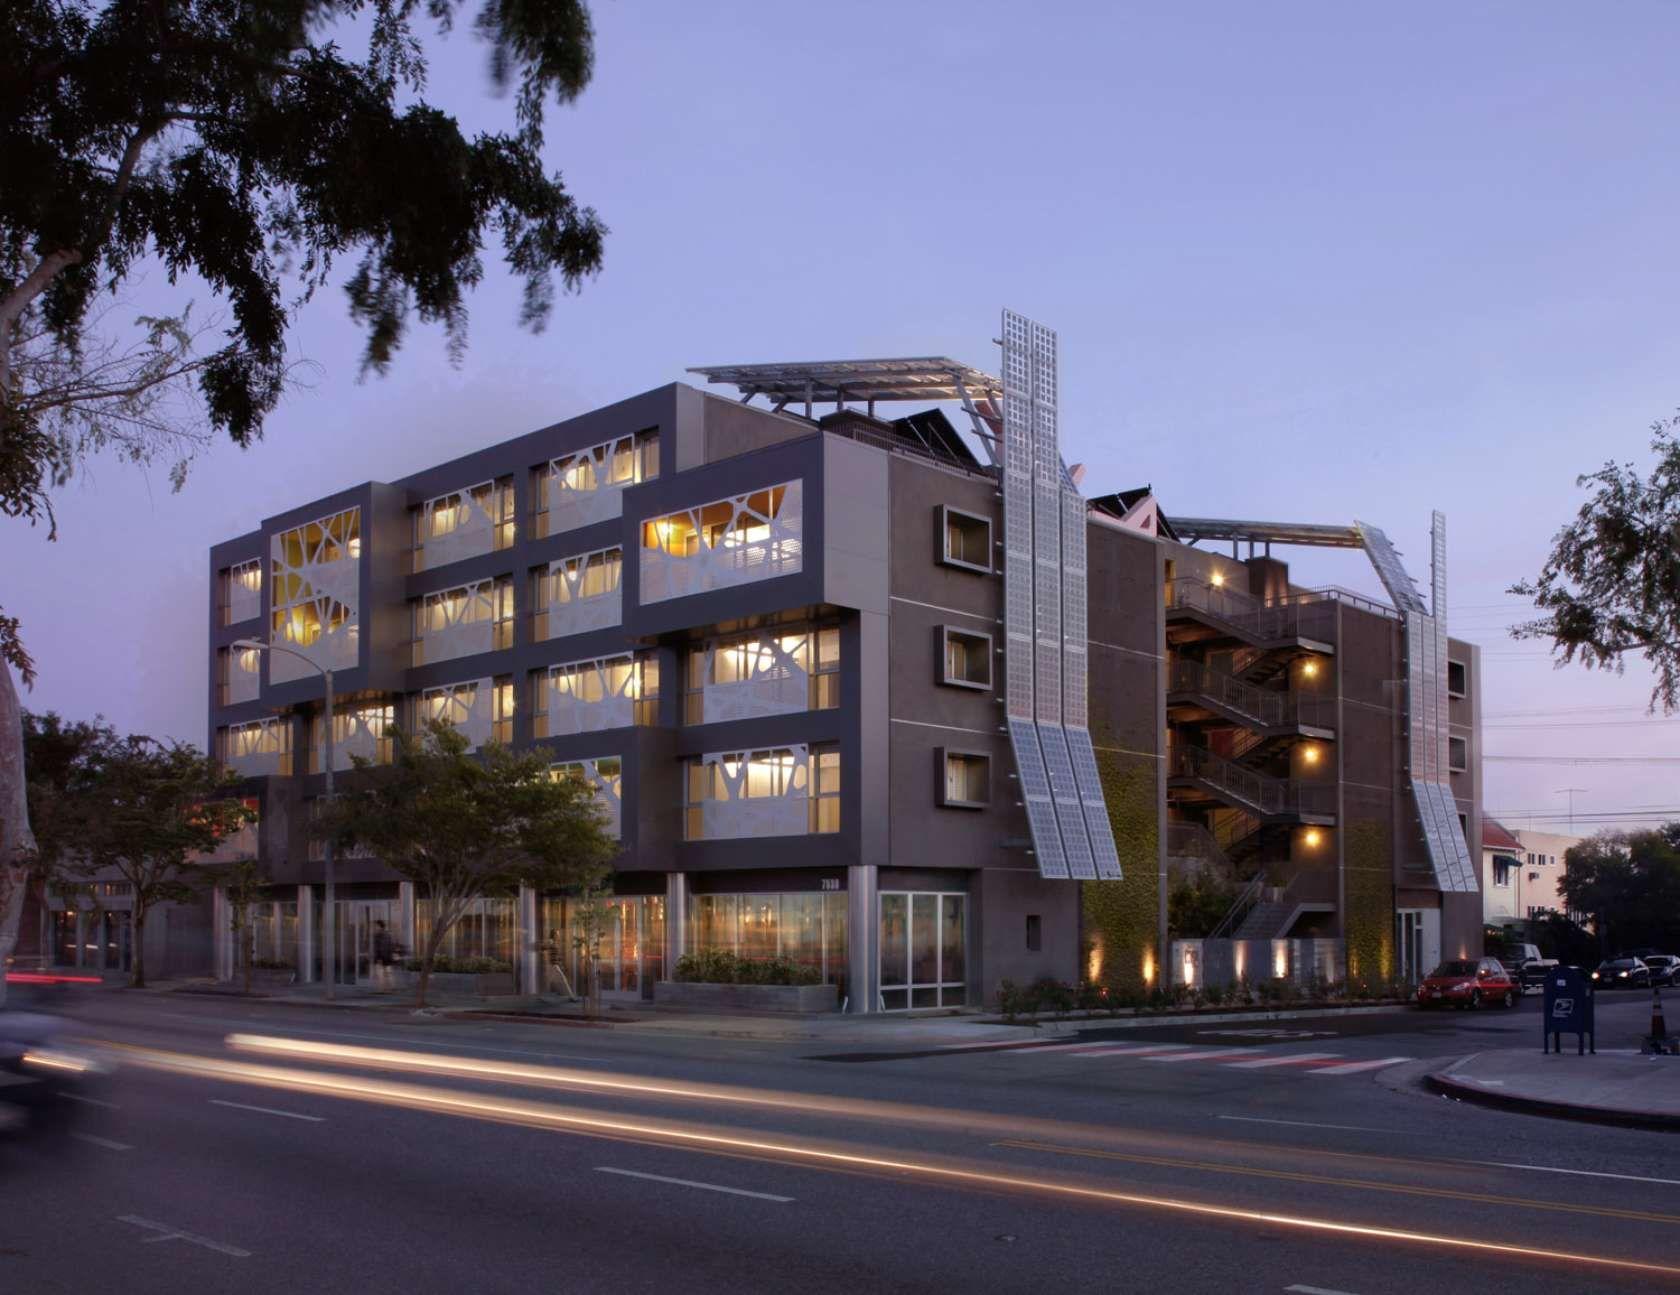 sierra bonita affordable housing tighe architecture los angeles